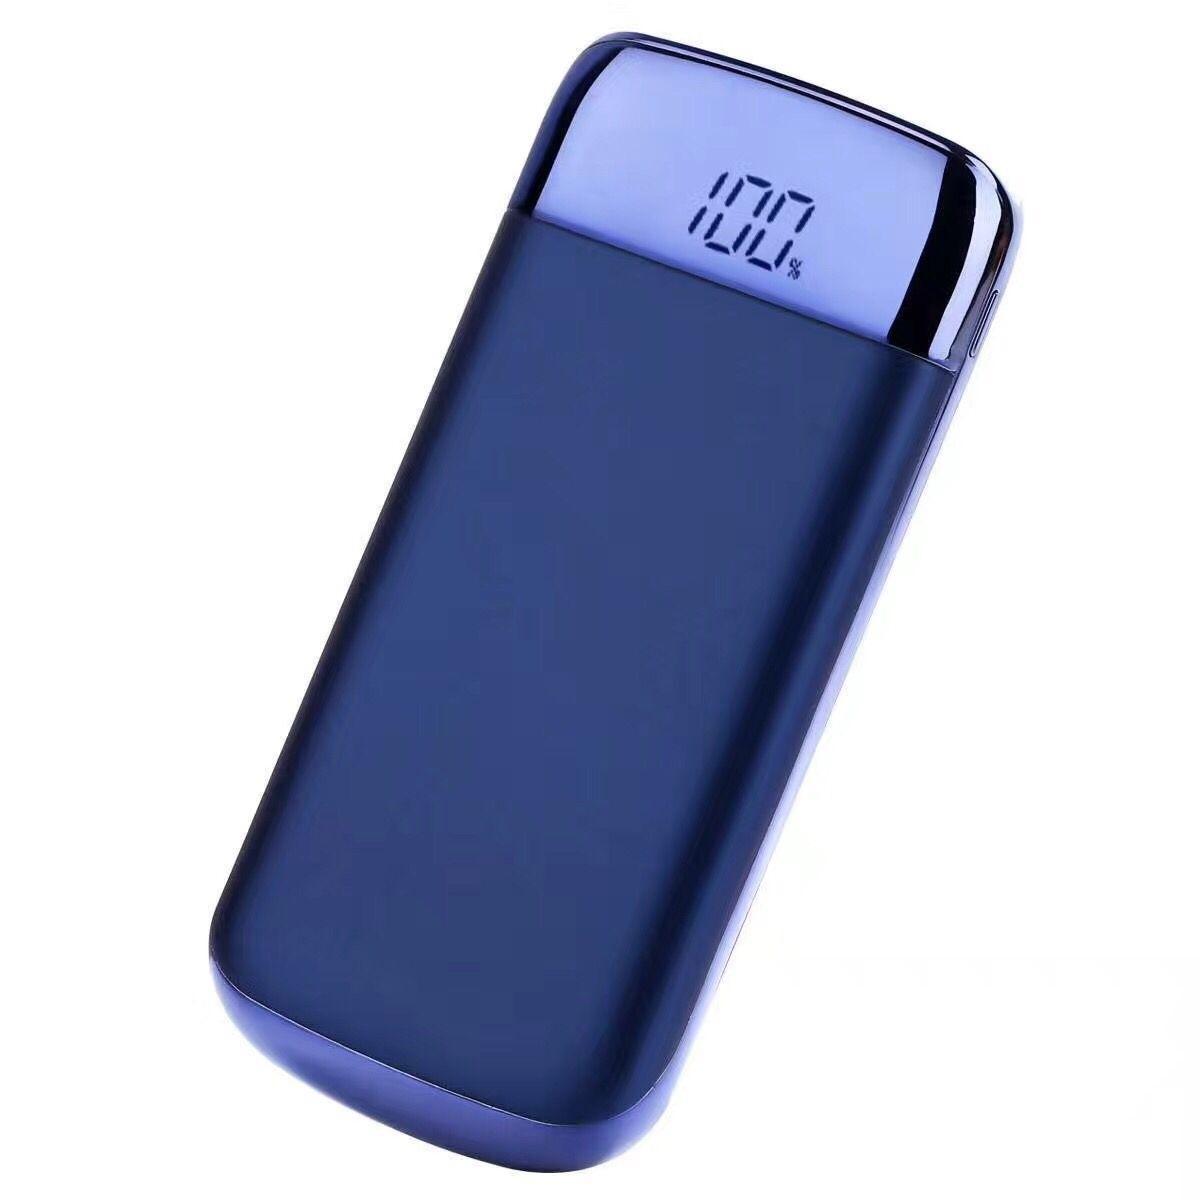 zarjadnoe power bank 10000 mach my10 18 - Зарядное-Power Bank 10000 мАч MY10: 2 USB, ЖК-экран, фонарик